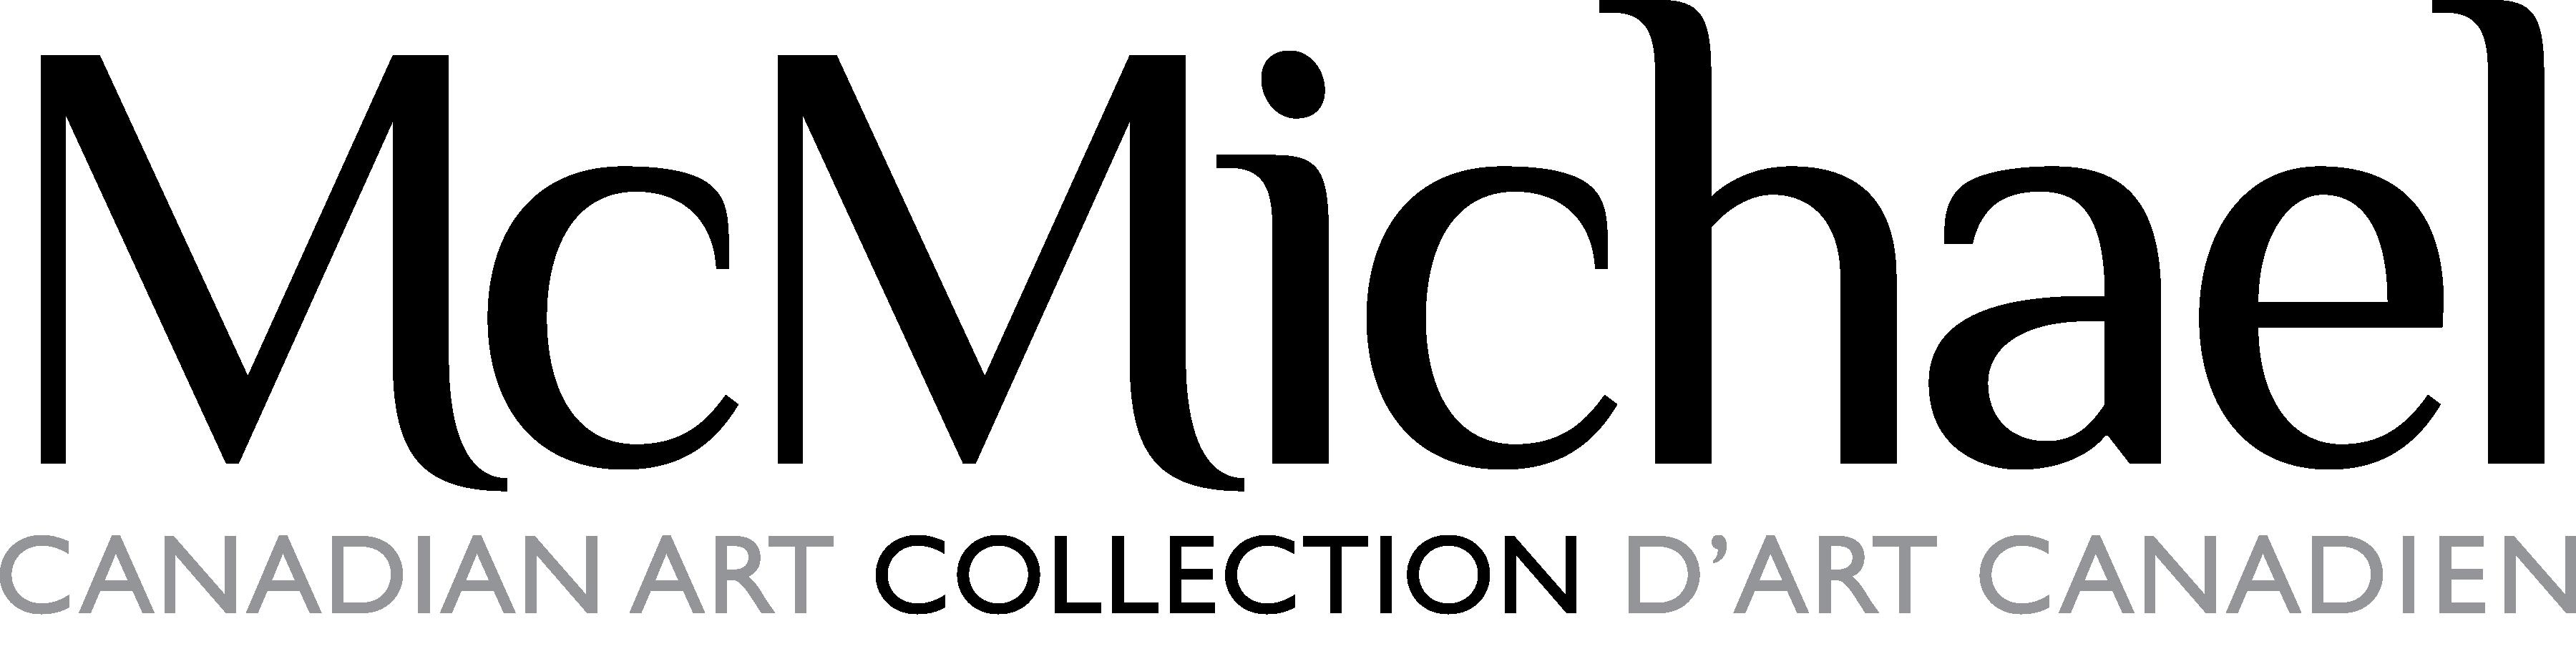 McMichael_logo.png